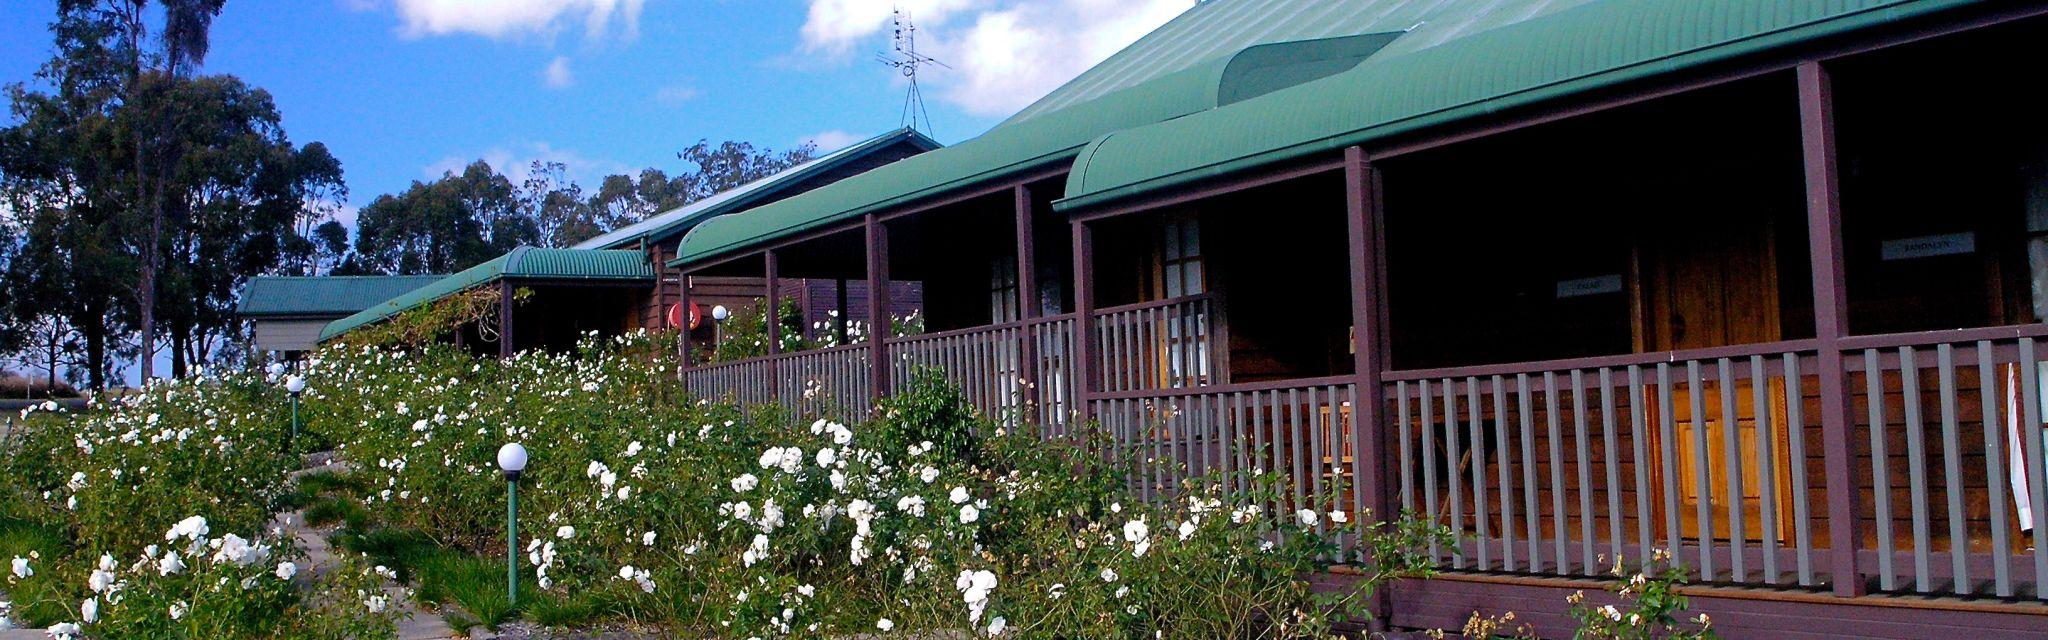 Hunter Valley motel accommodation on Seniors Over 50s Holidays